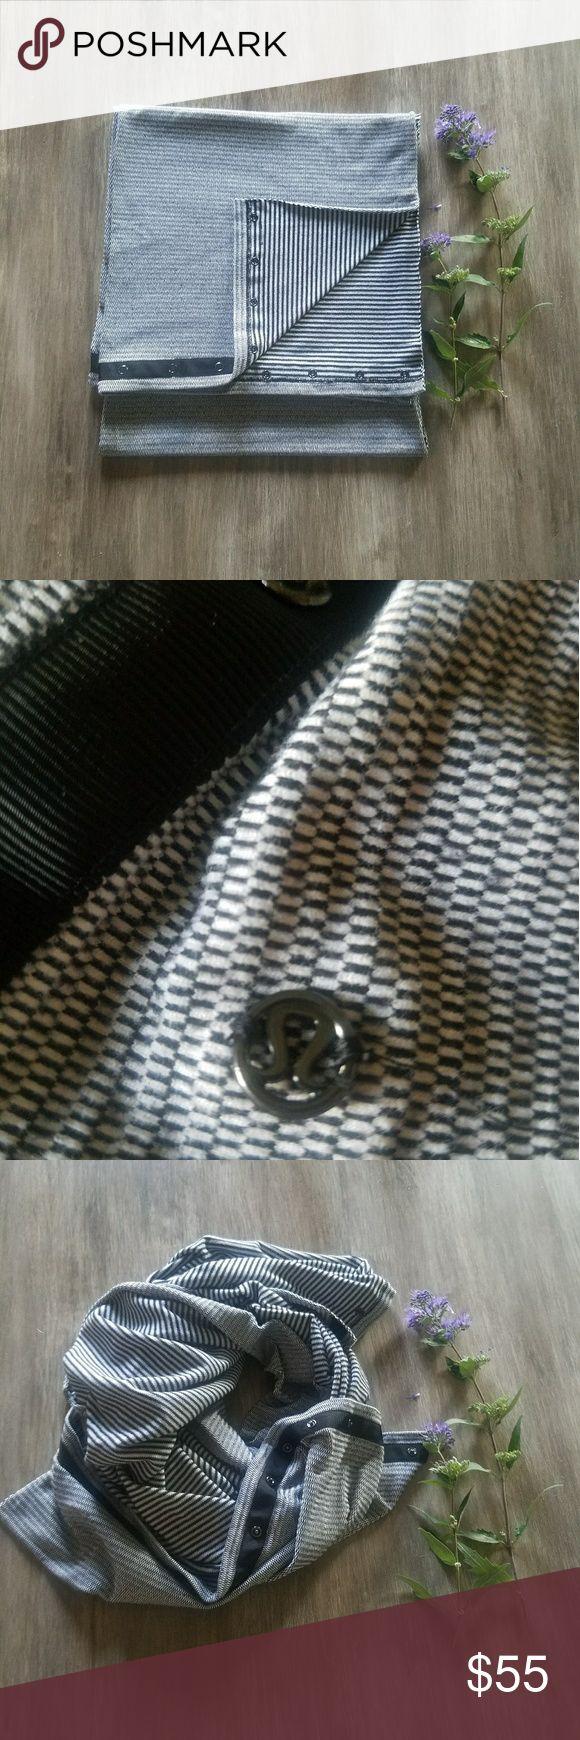 💖FINAL SALE💖 lululemon  scarf.🍋 Black and white lululemon button up scarf. lululemon athletica Accessories Scarves & Wraps